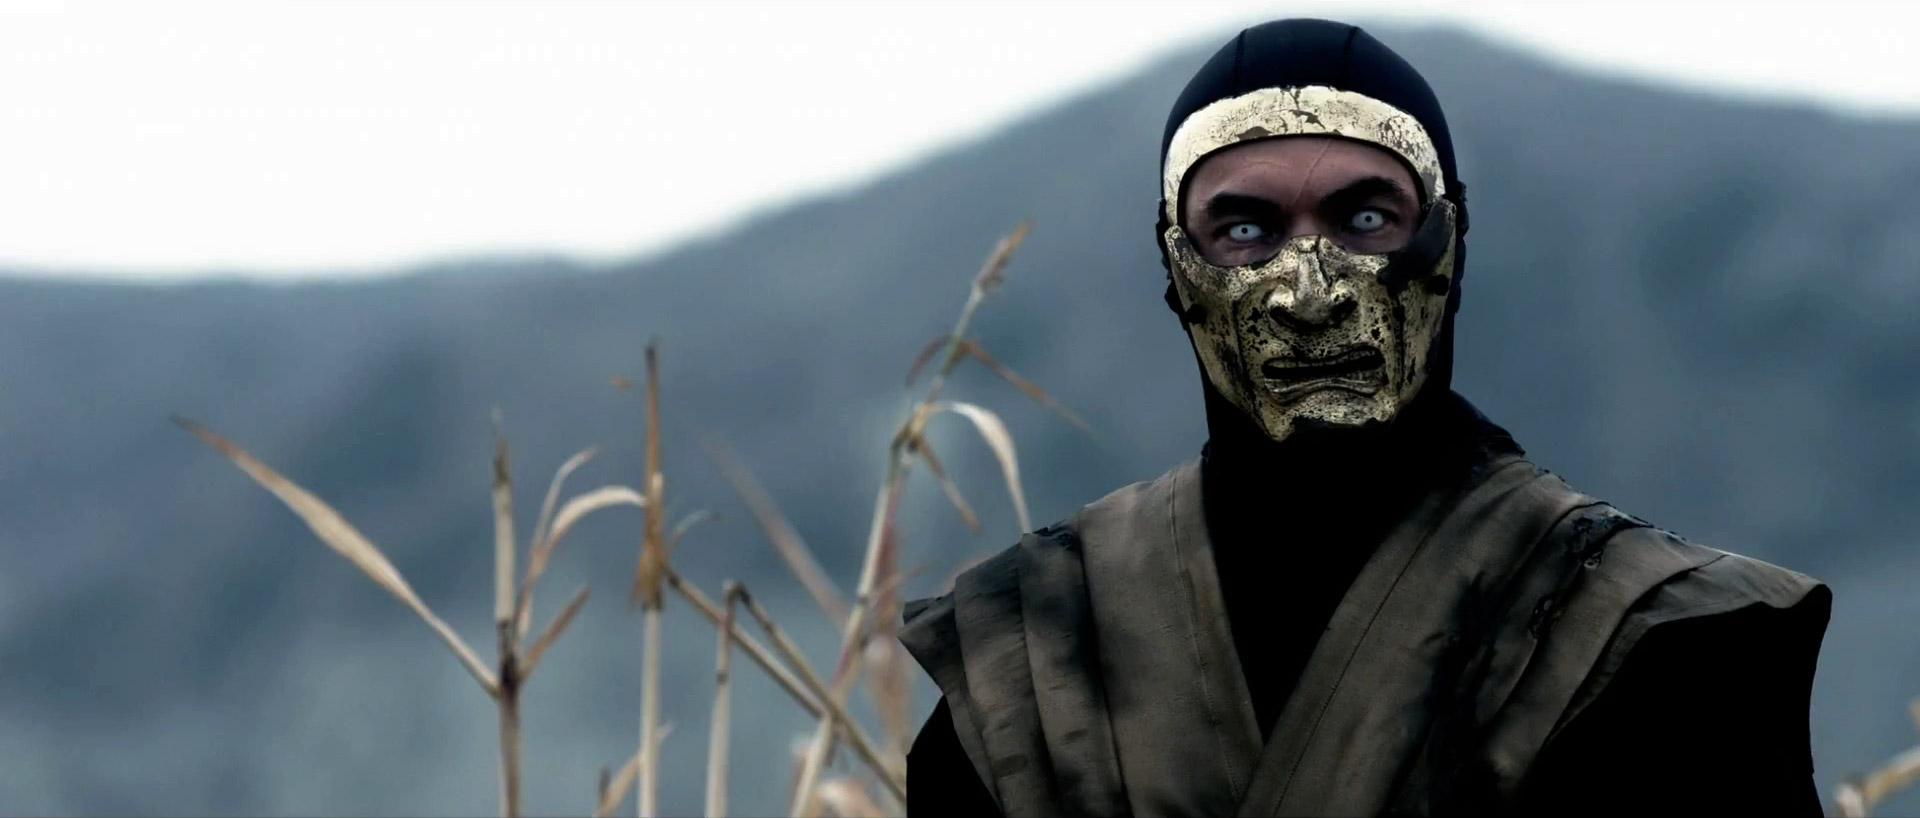 _badass-trailer-for-mortal-kombat-legacy-ii-05.jpg